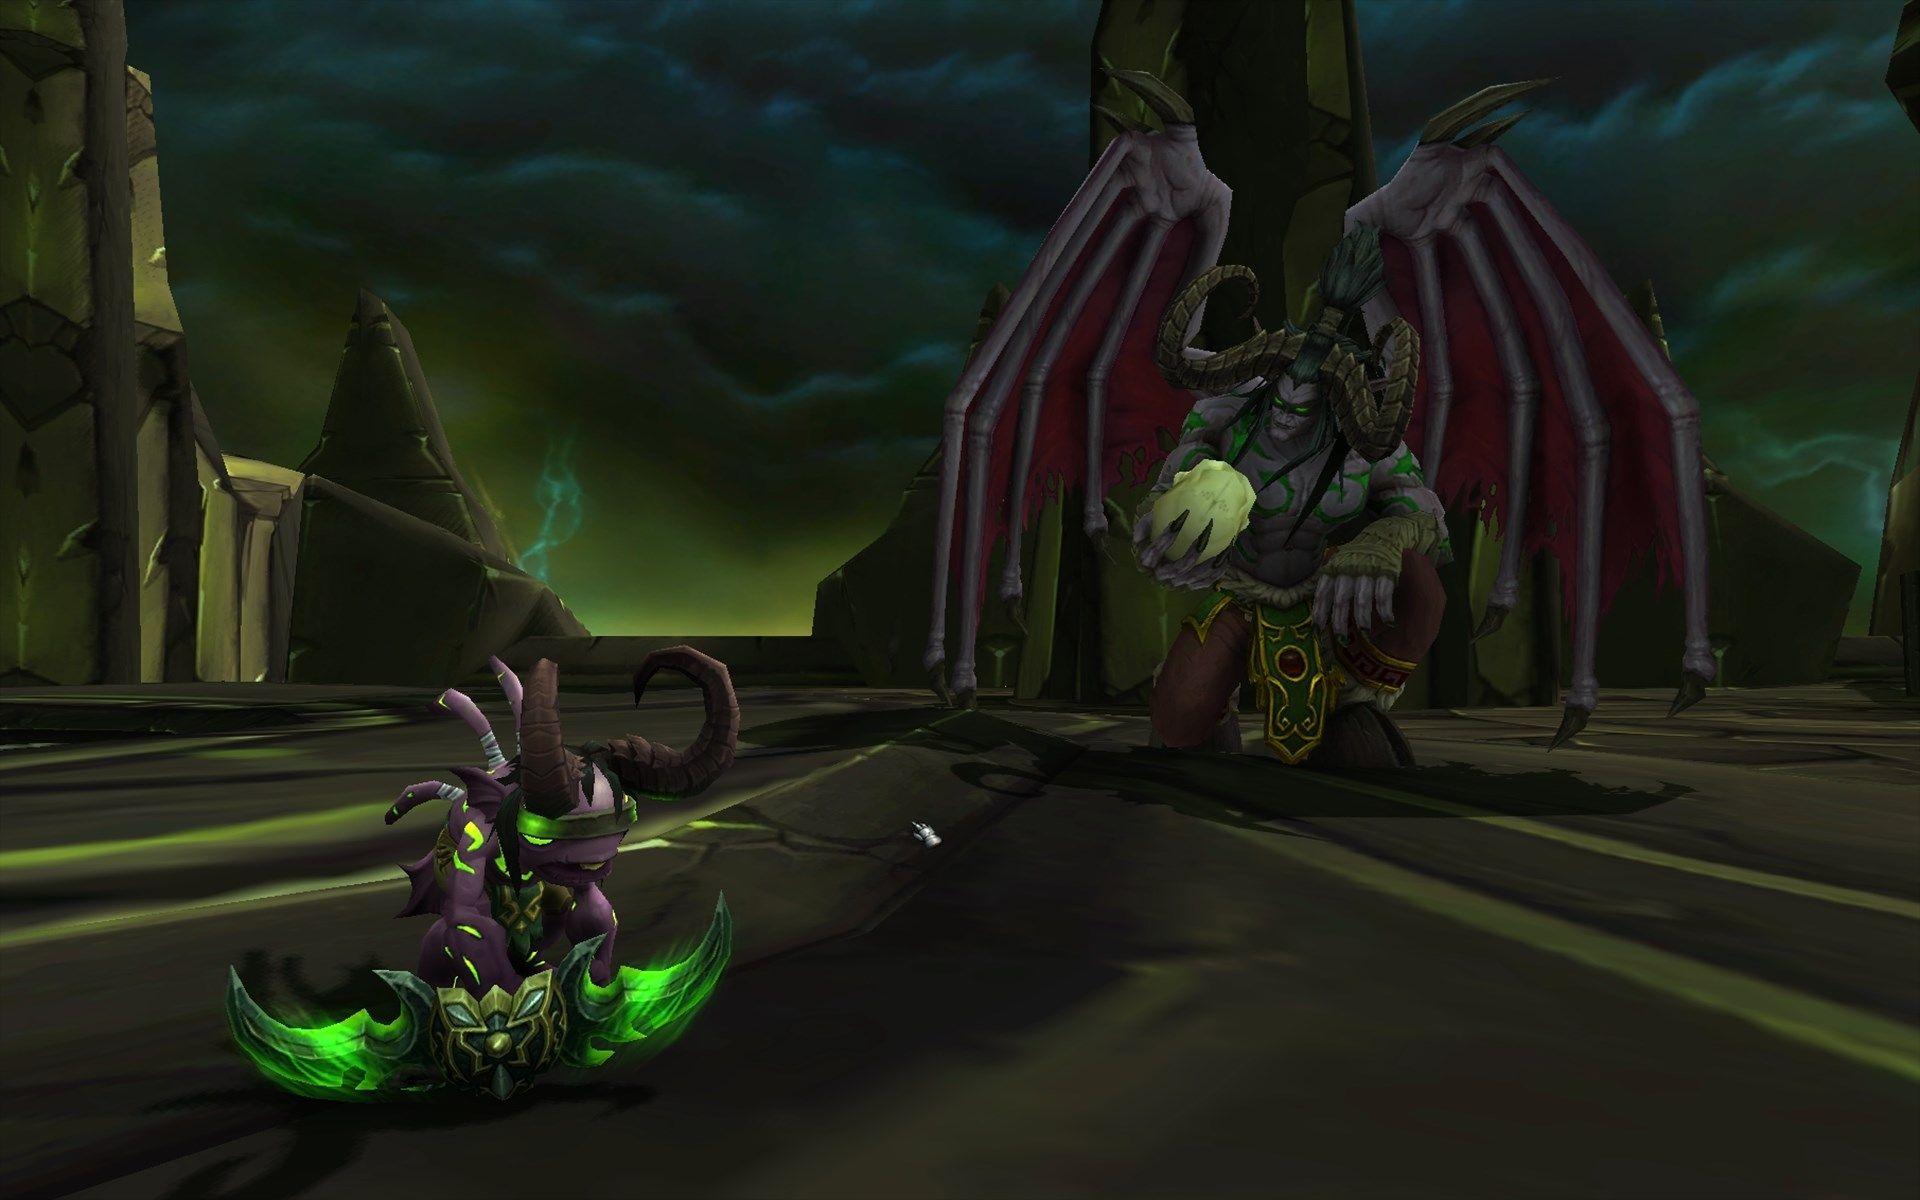 world-of-warcraft-screenshot-24